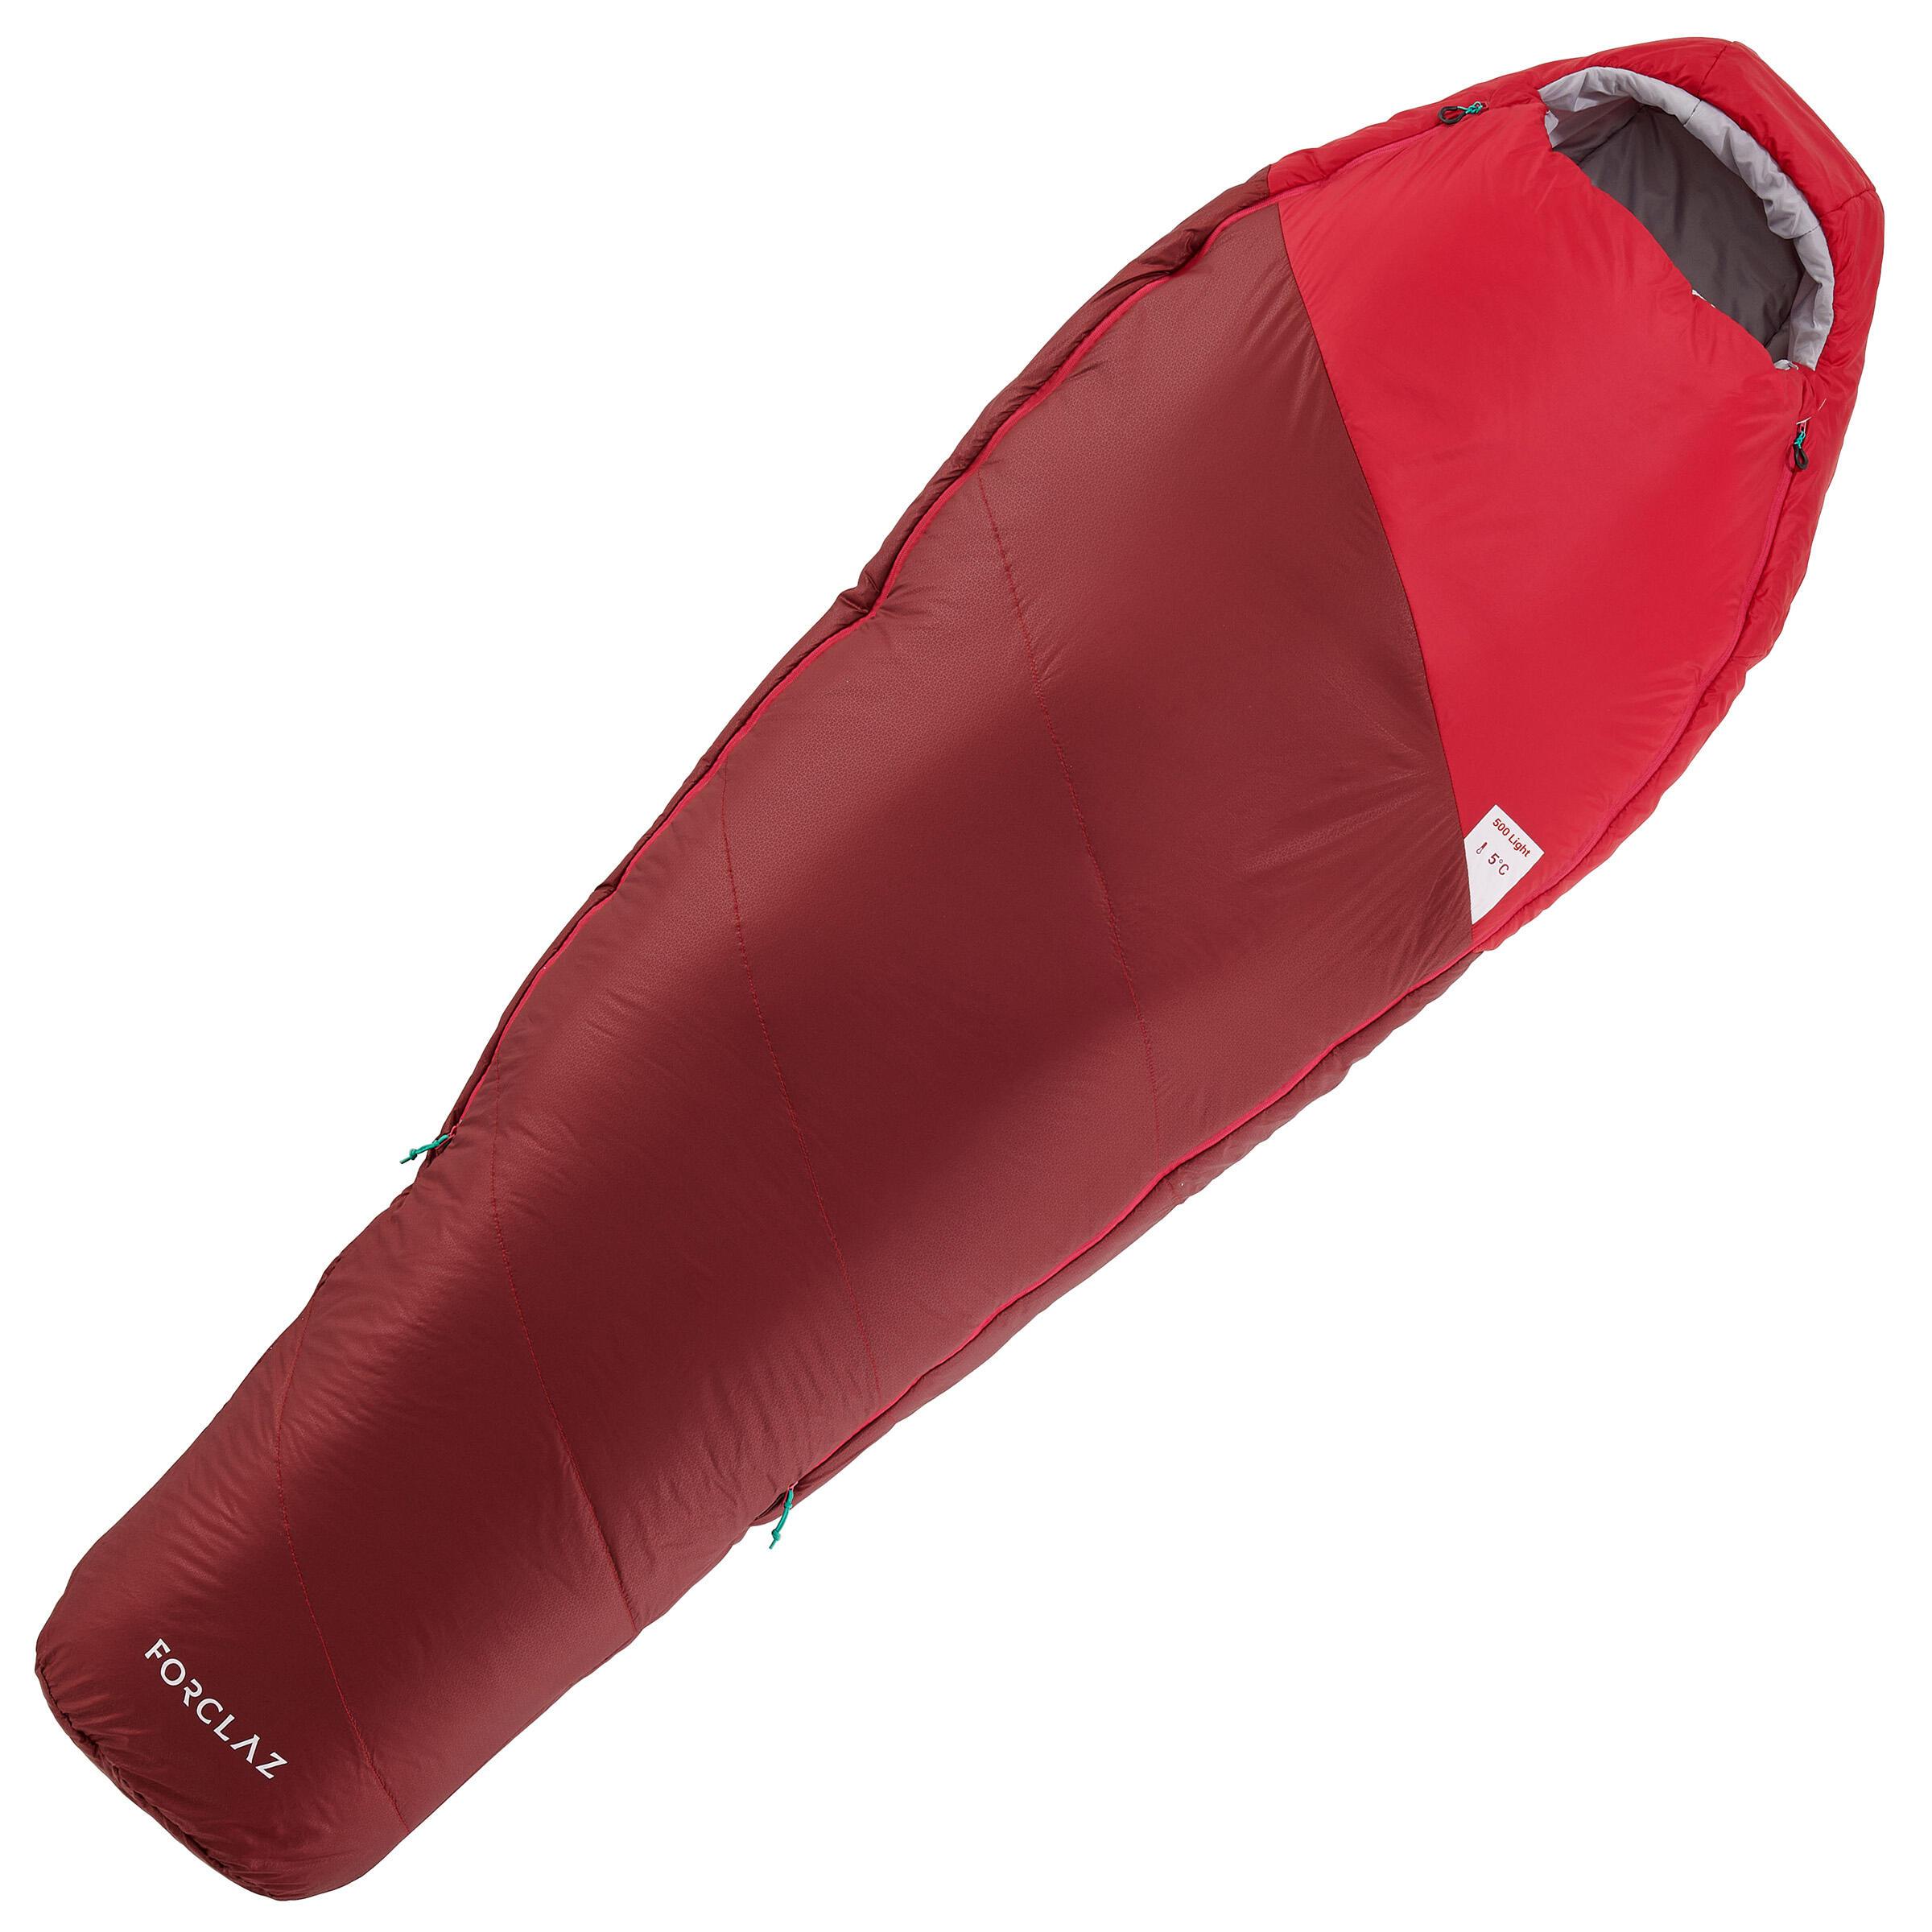 500 5° Trekking Sleeping Bag - Light Pink